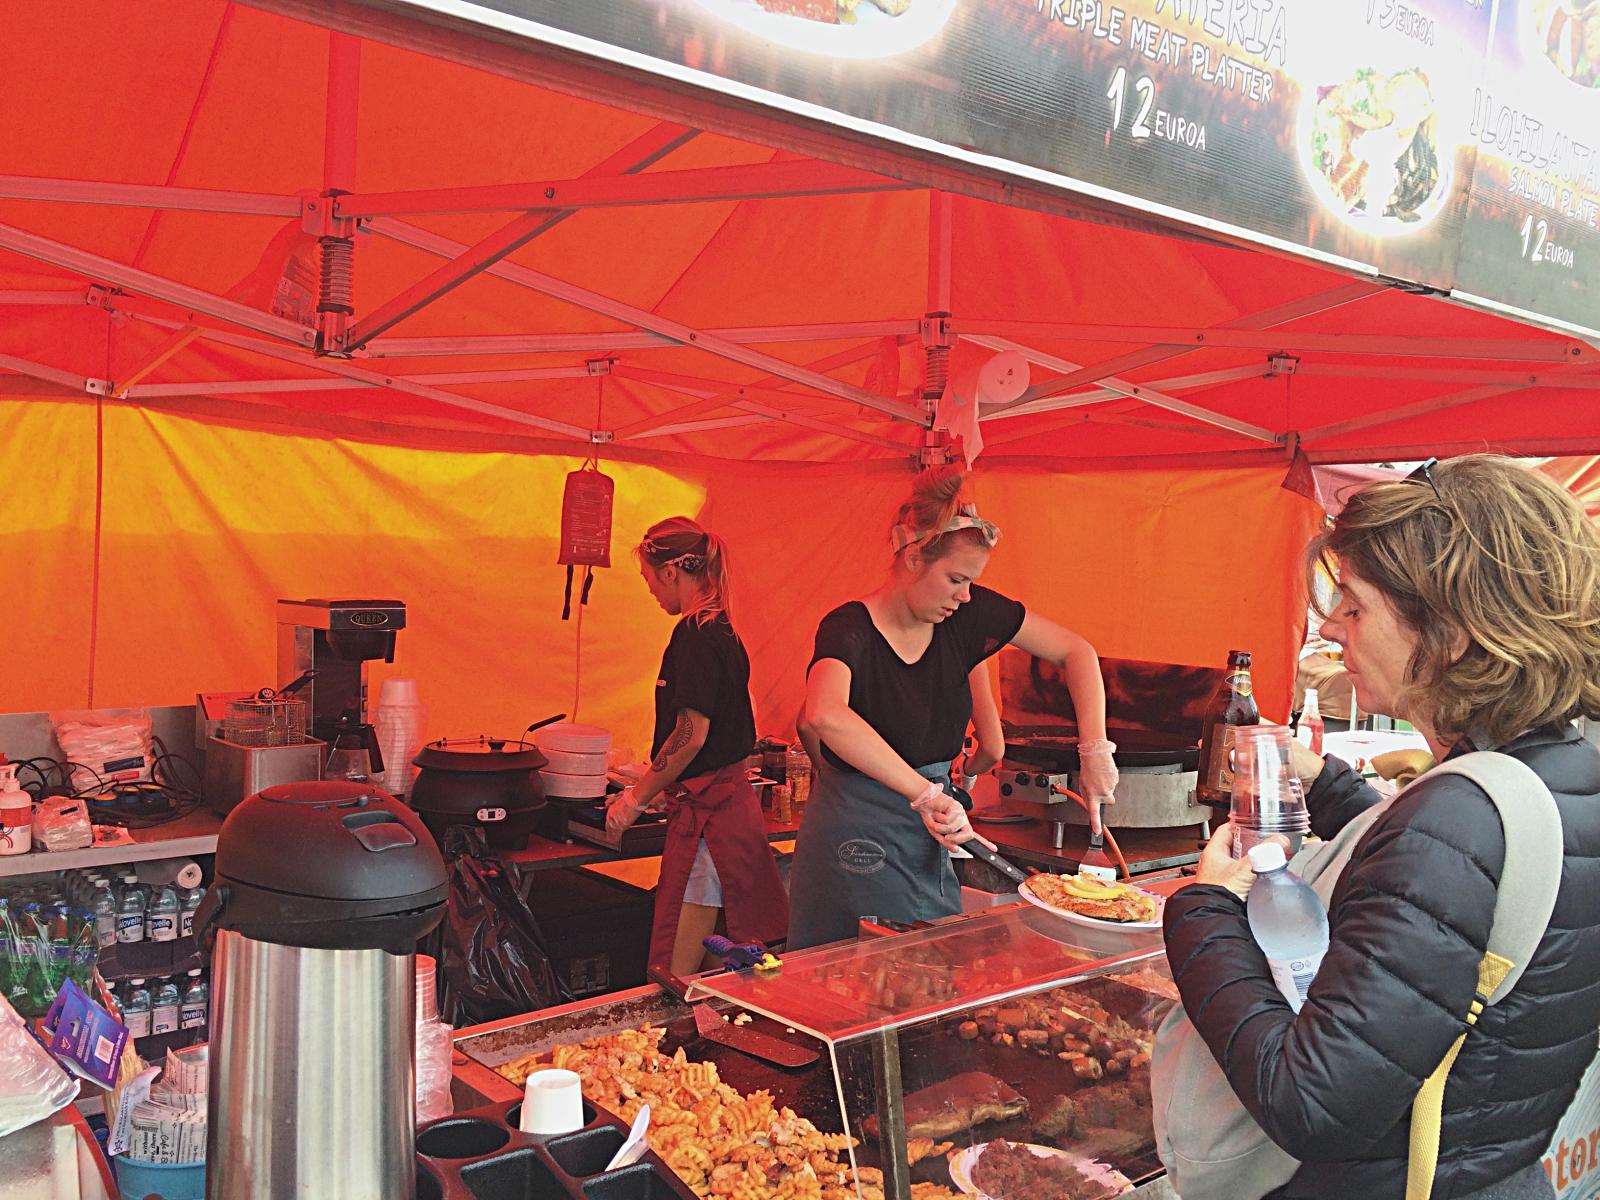 Helsinki Market Square Fish & Chips